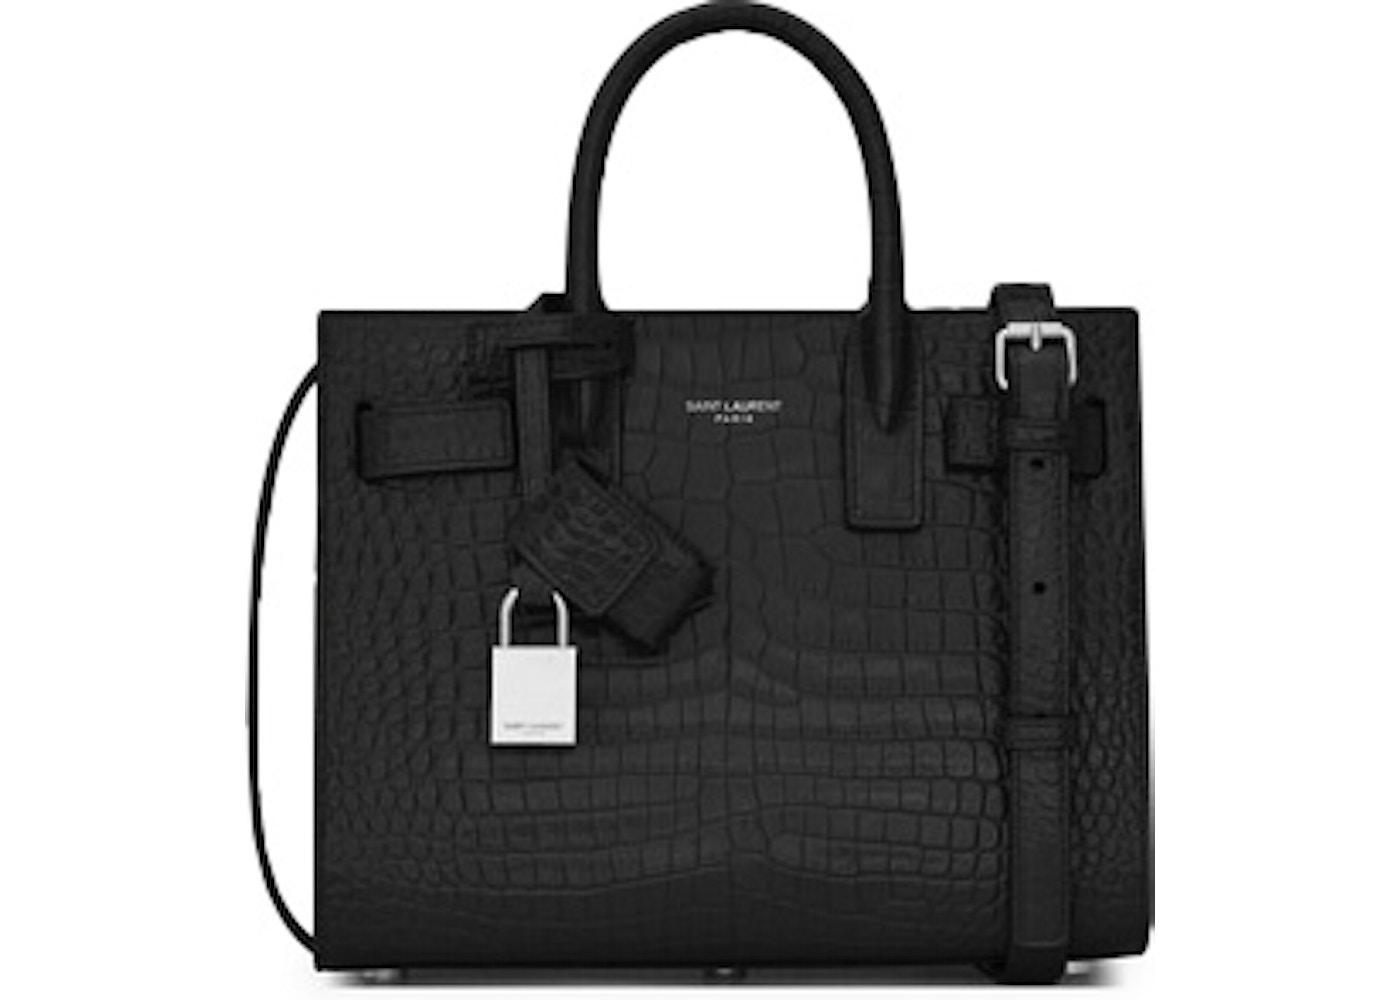 3301799093 Buy & Sell Saint Laurent Sac de Jour Handbags